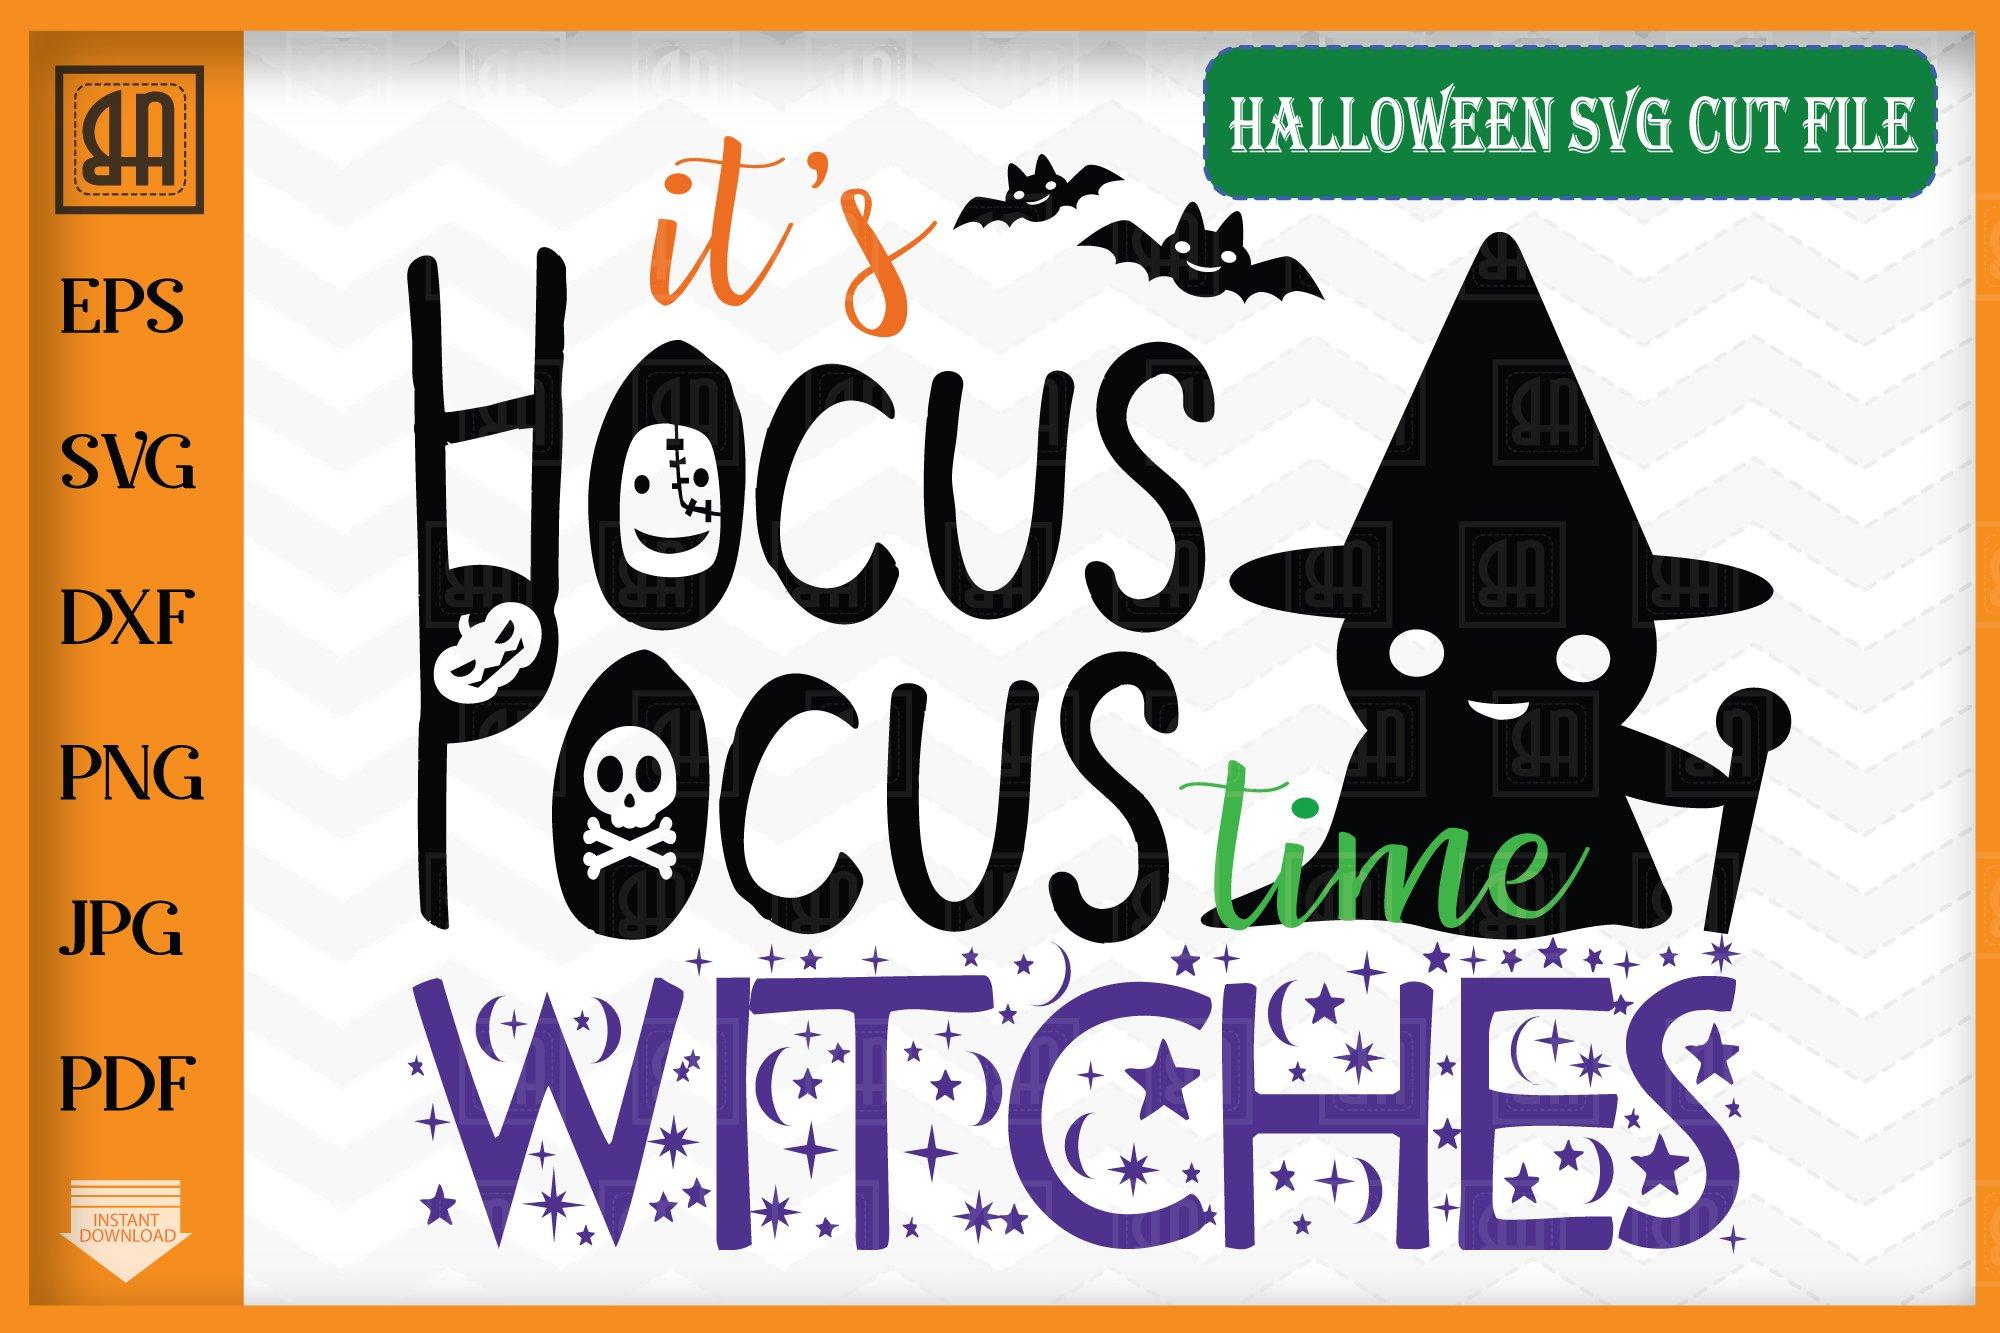 Hocus Pocus Time Svg Witches Svg Halloween Svg 359977 Cut Files Design Bundles